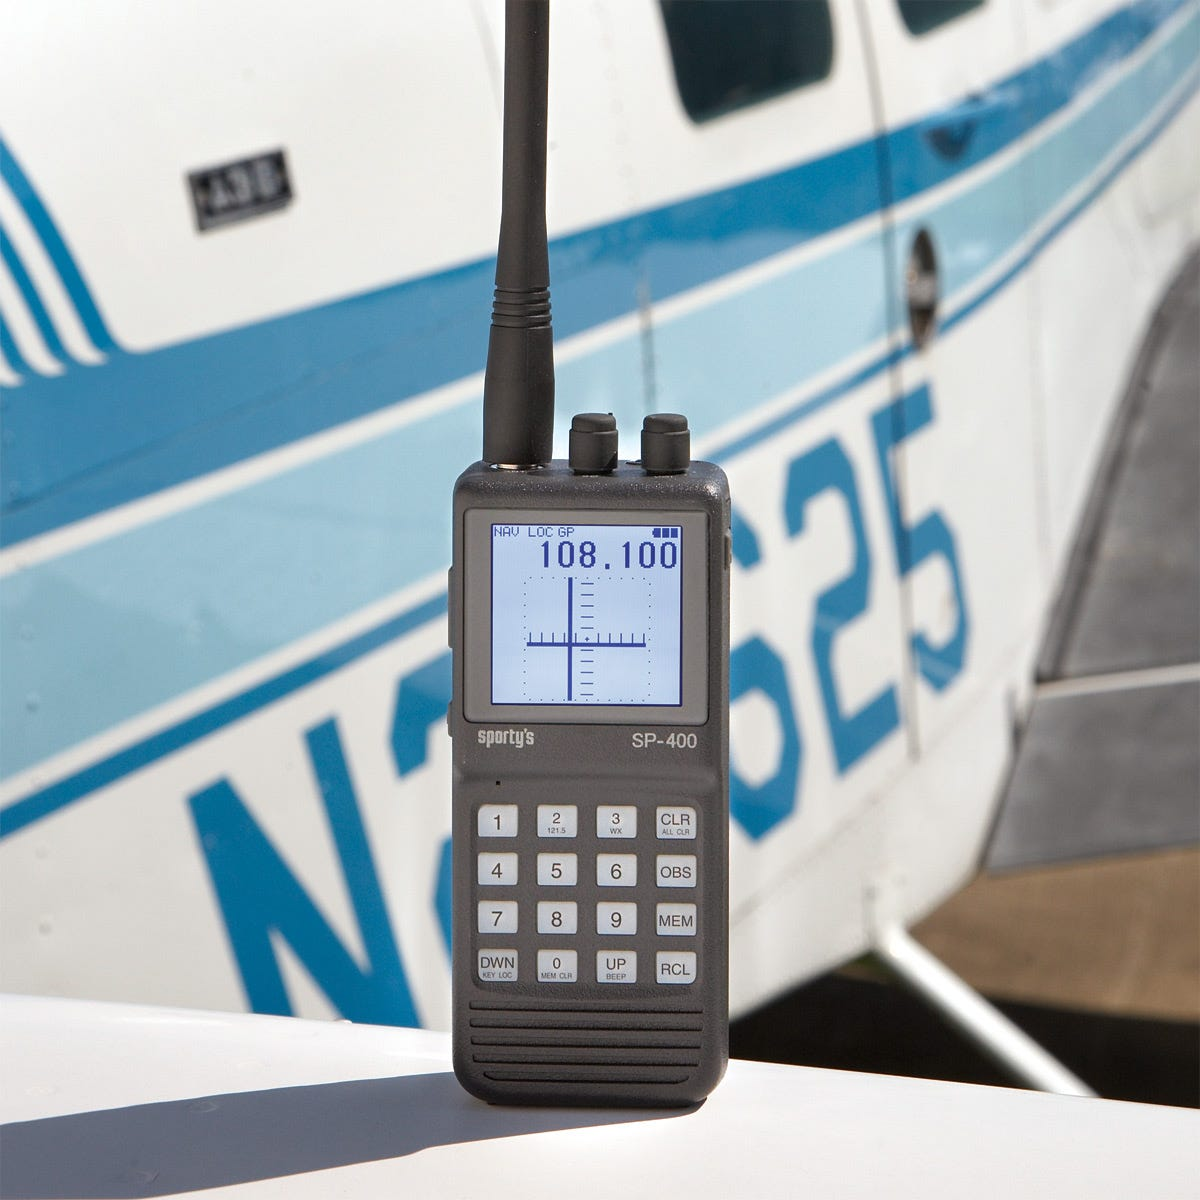 Sporty\'s SP-400 Handheld NAV/COM Aviation Radio - from Sporty\'s ...